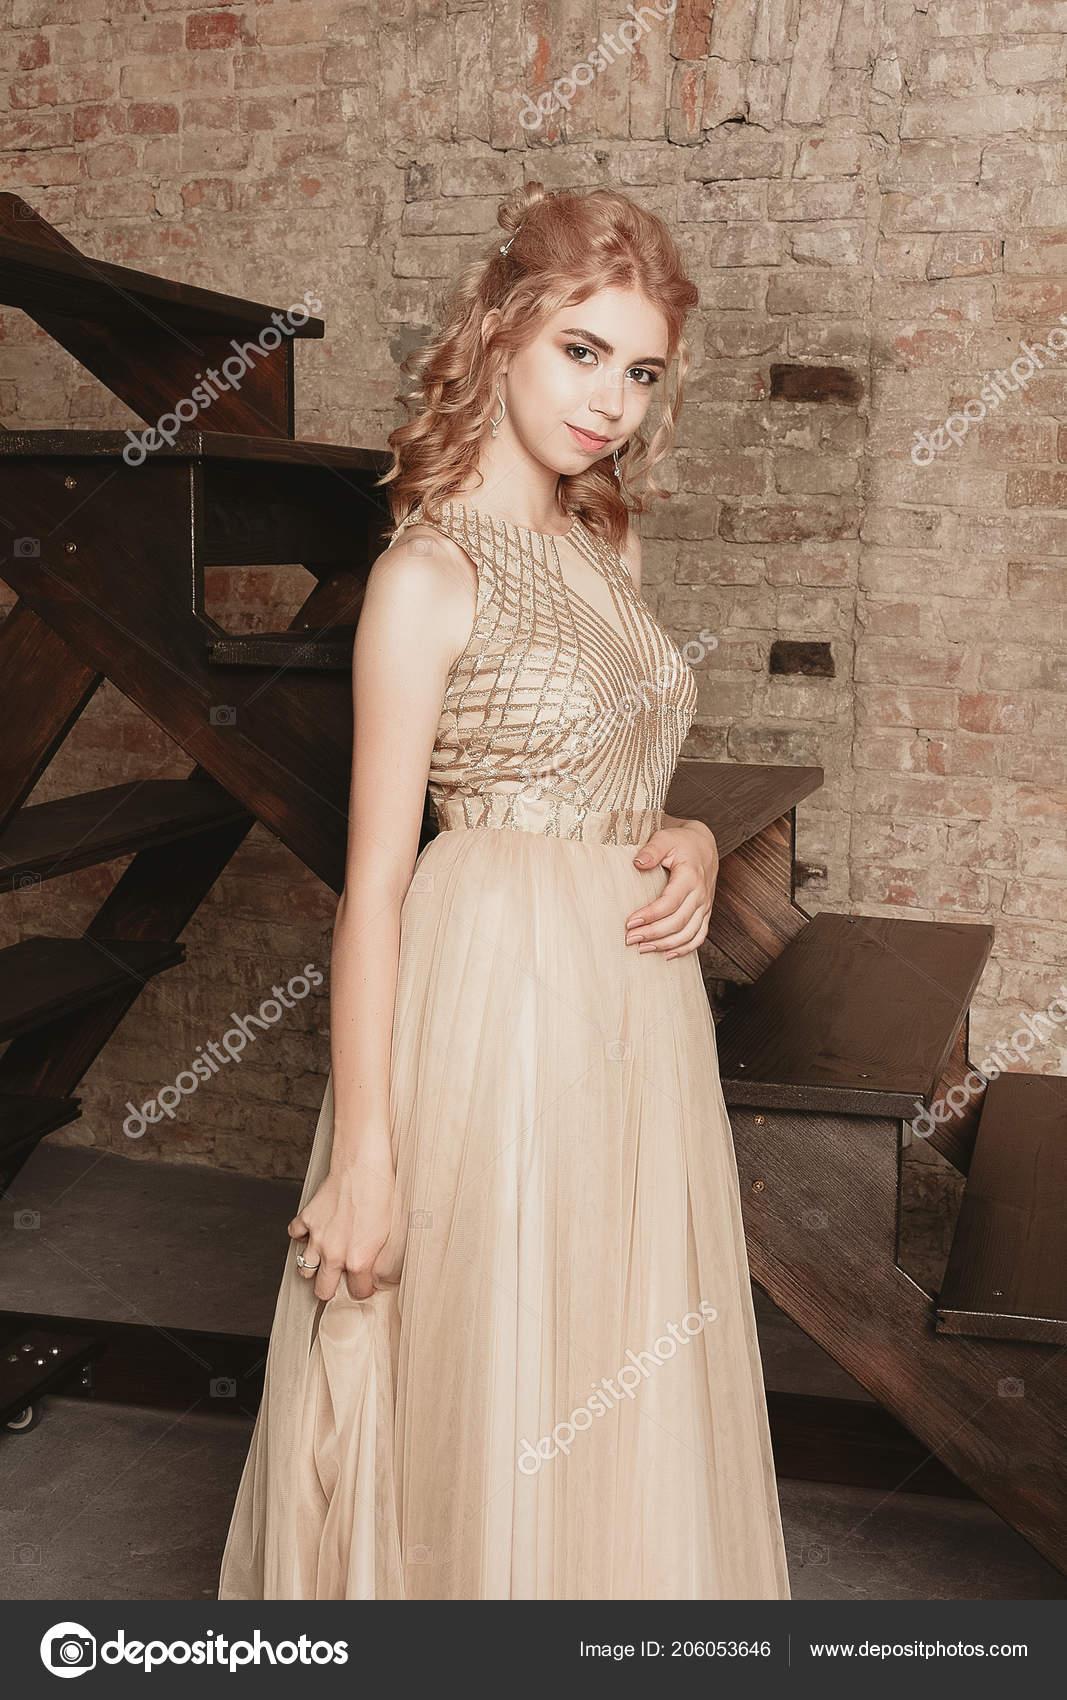 eb089314c Modelo Moda Bege Luxo Fluindo Vestido Chiffon Mulher Vestido Noite —  Fotografia de Stock